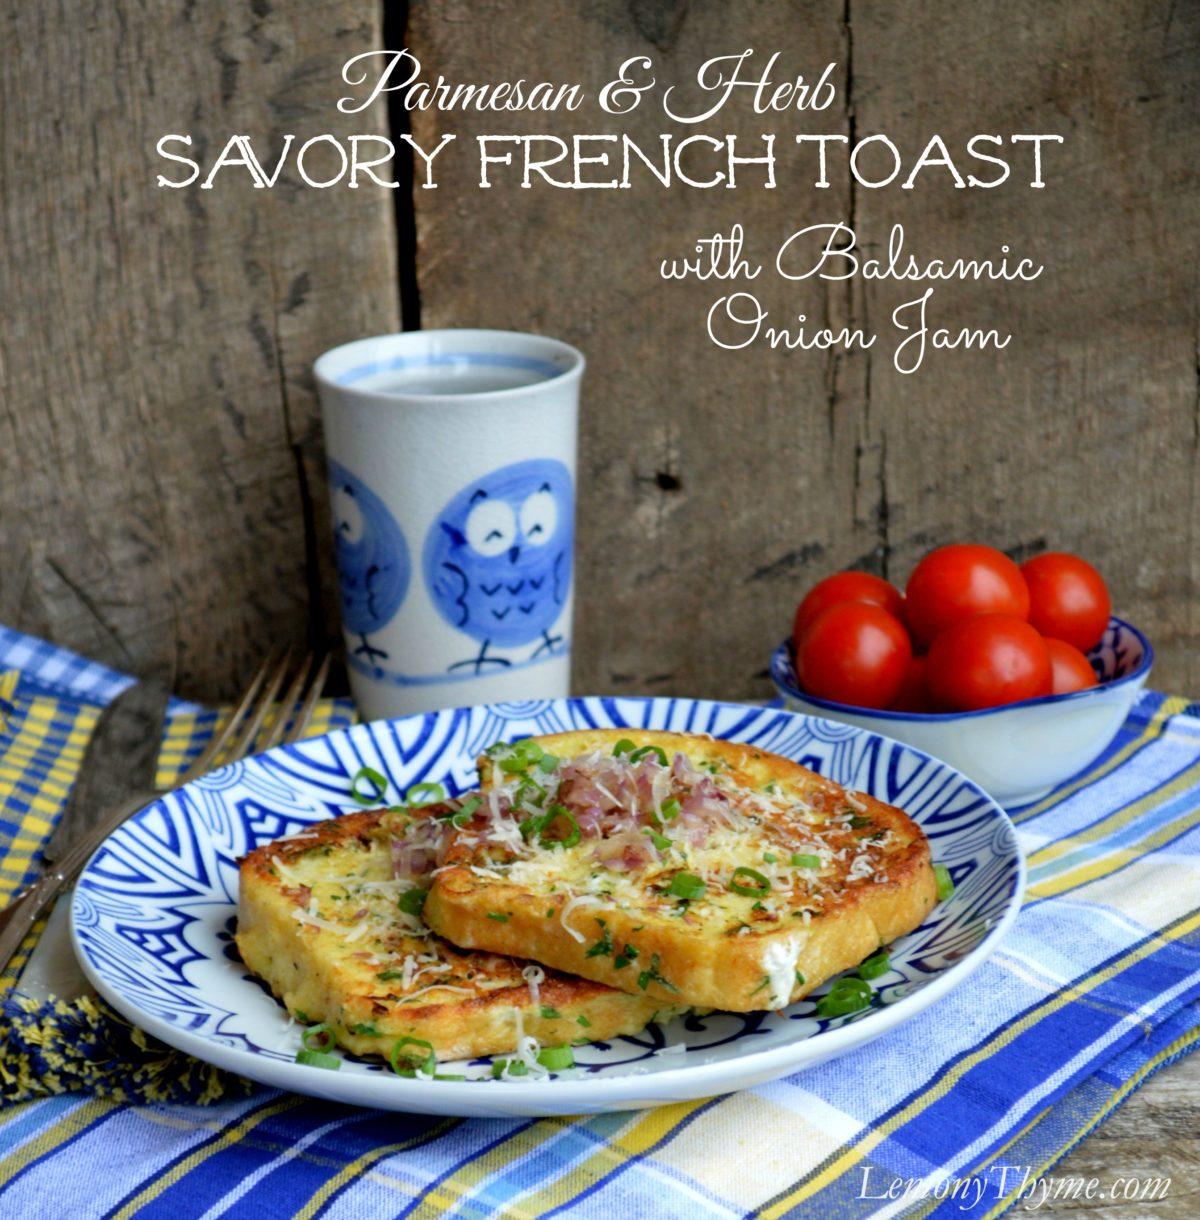 Parmesan & Herb Savory French Toast wtih Balsamic Onion Jam ...